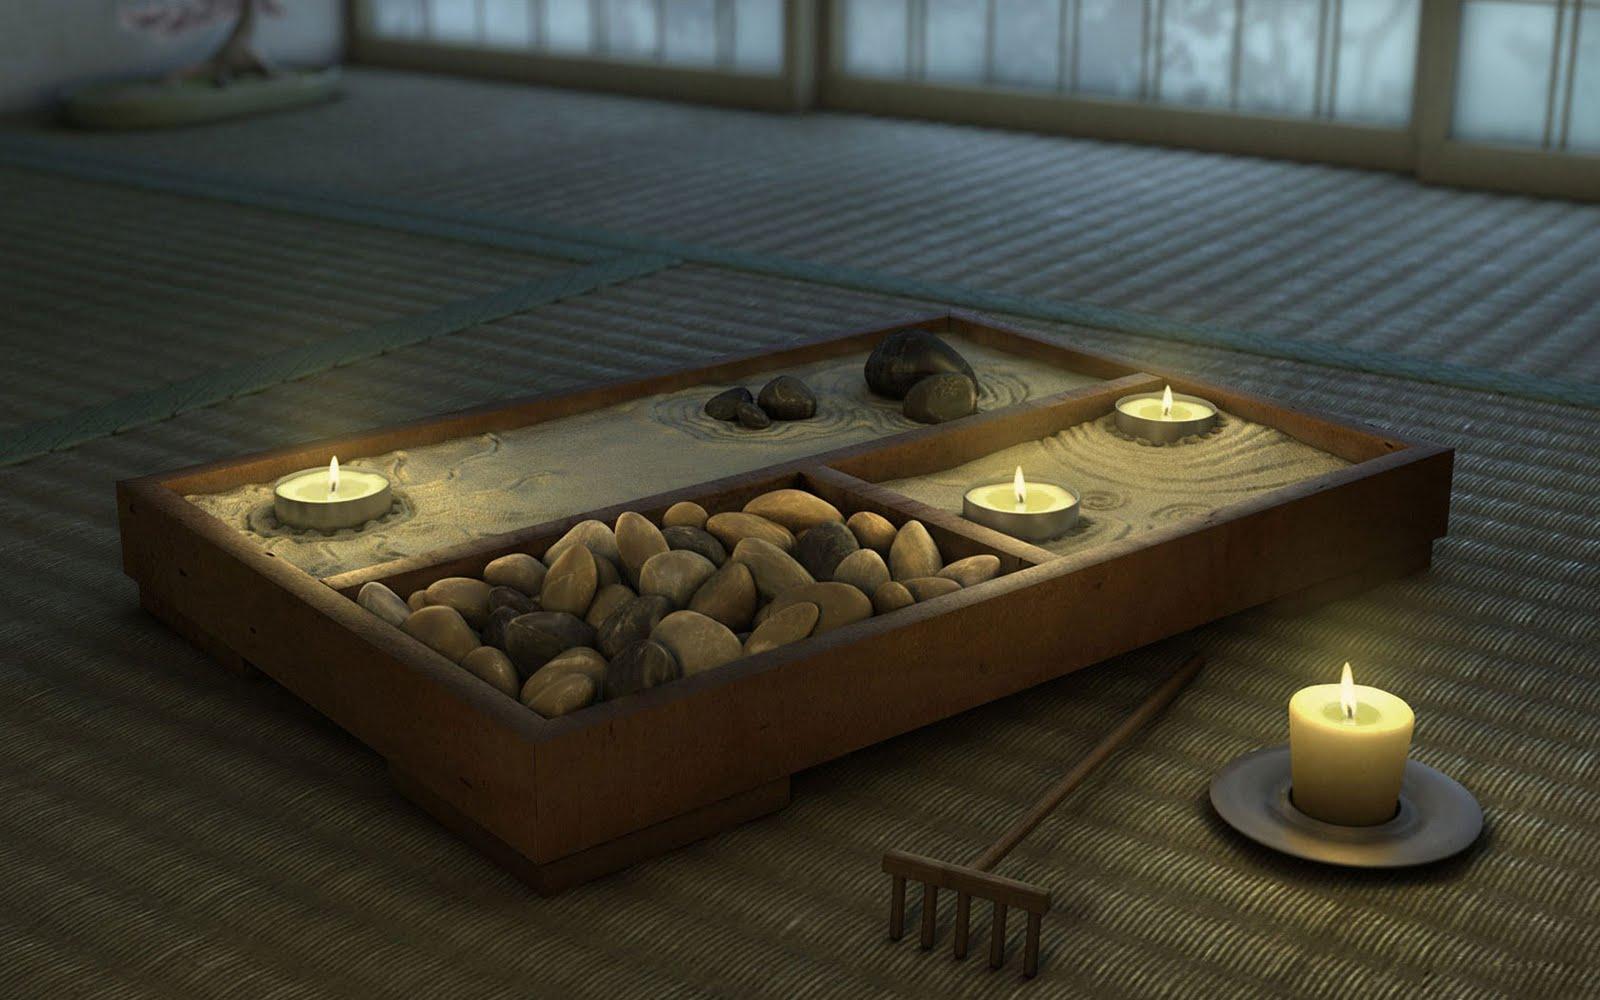 Unique Japanese Zen Garden Wallpaper Hd Background For Decorating